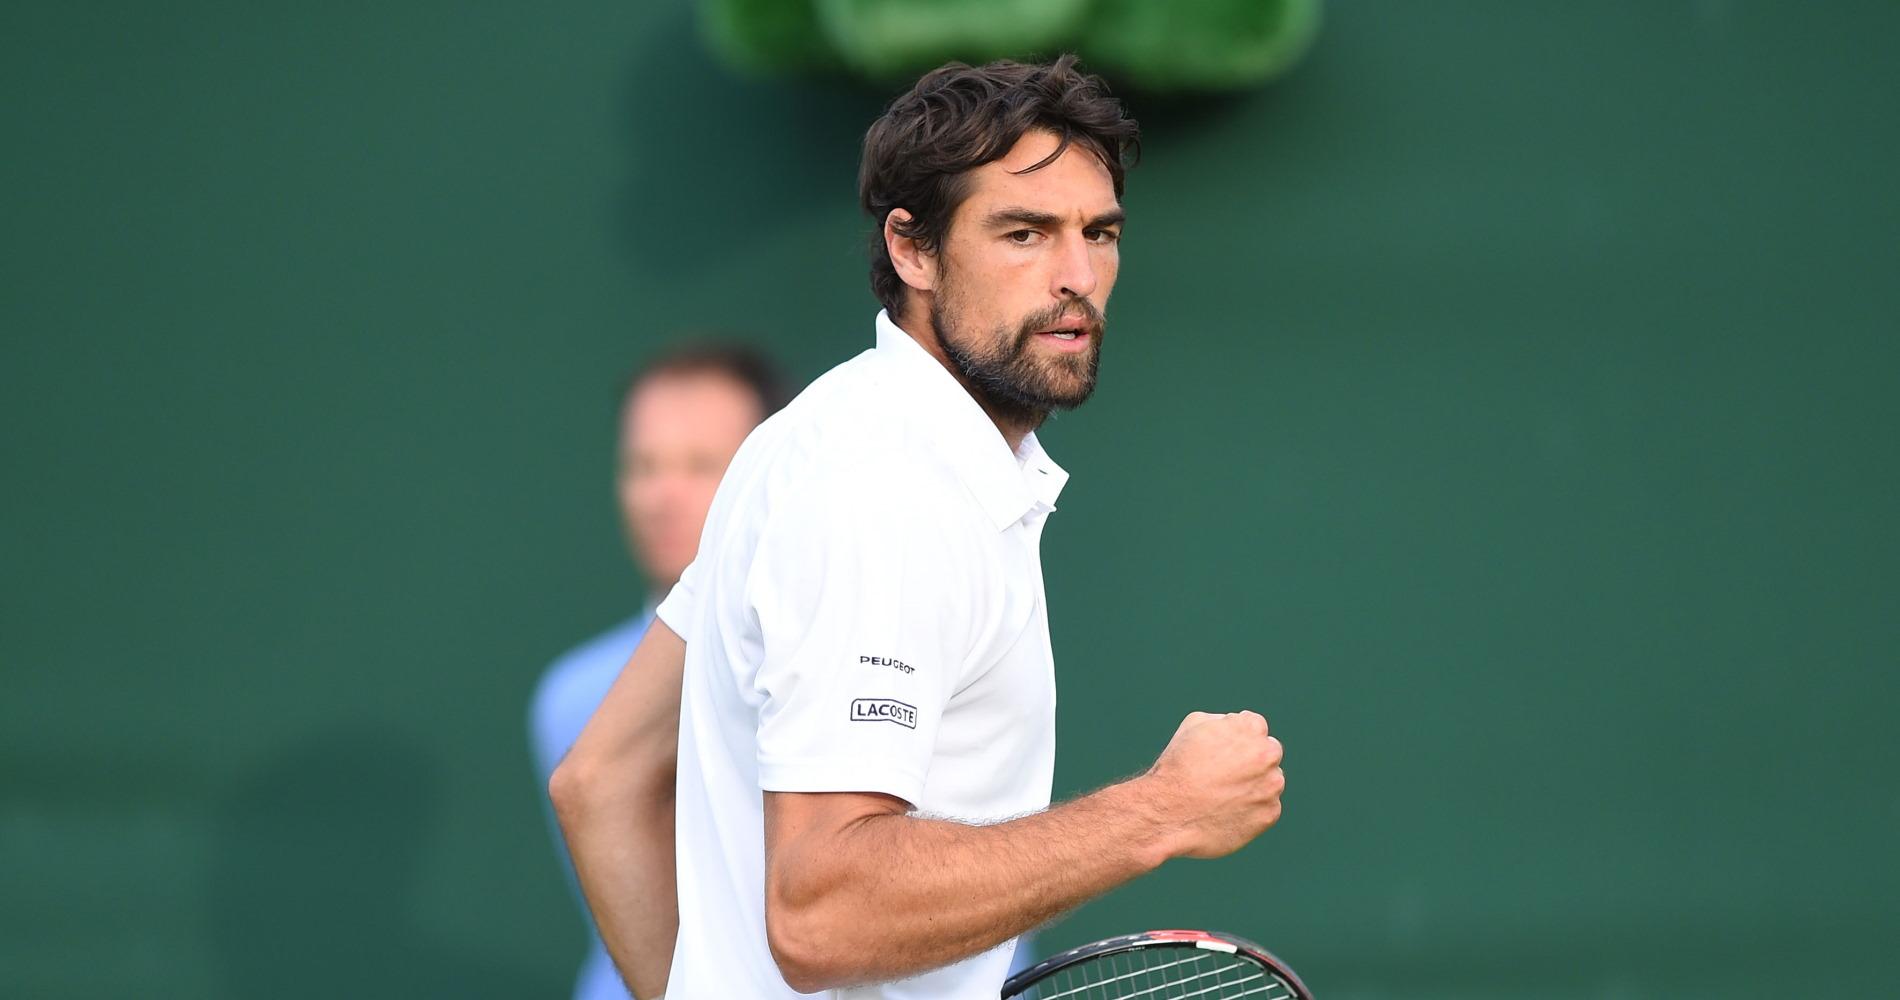 Jérémy Chardy, Wimbledon 2016